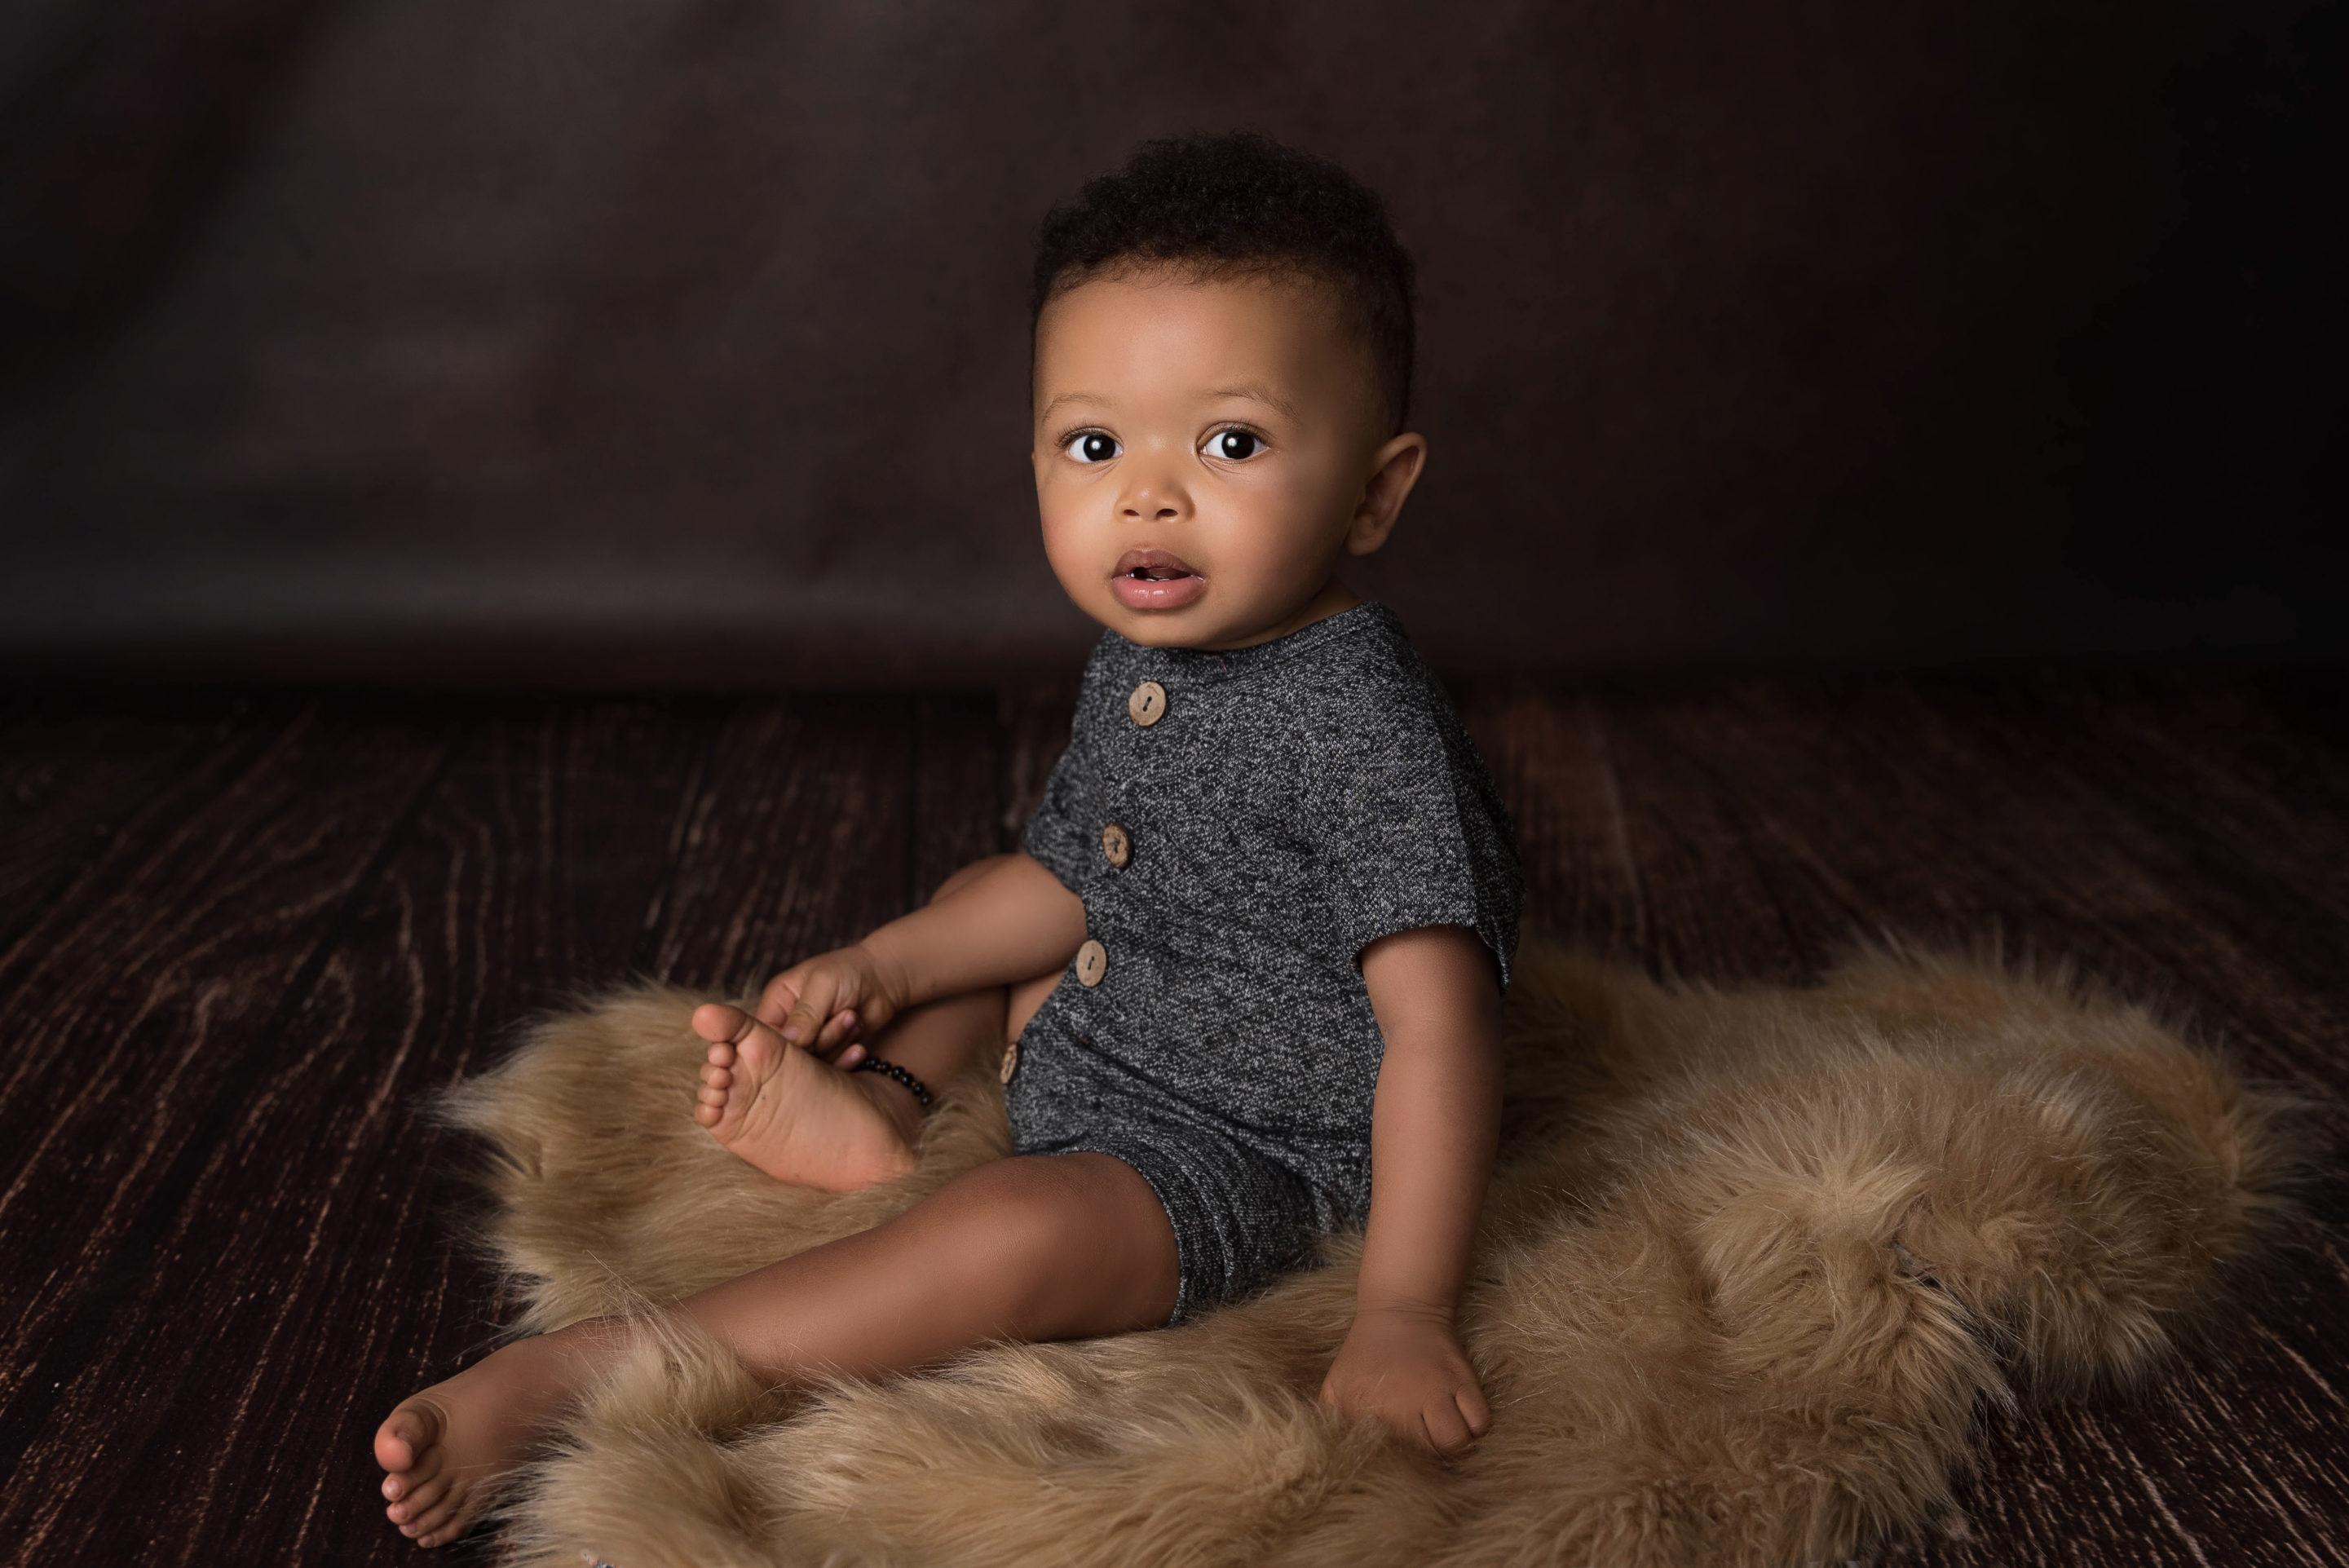 Séance bébé Aurélie (3)ca